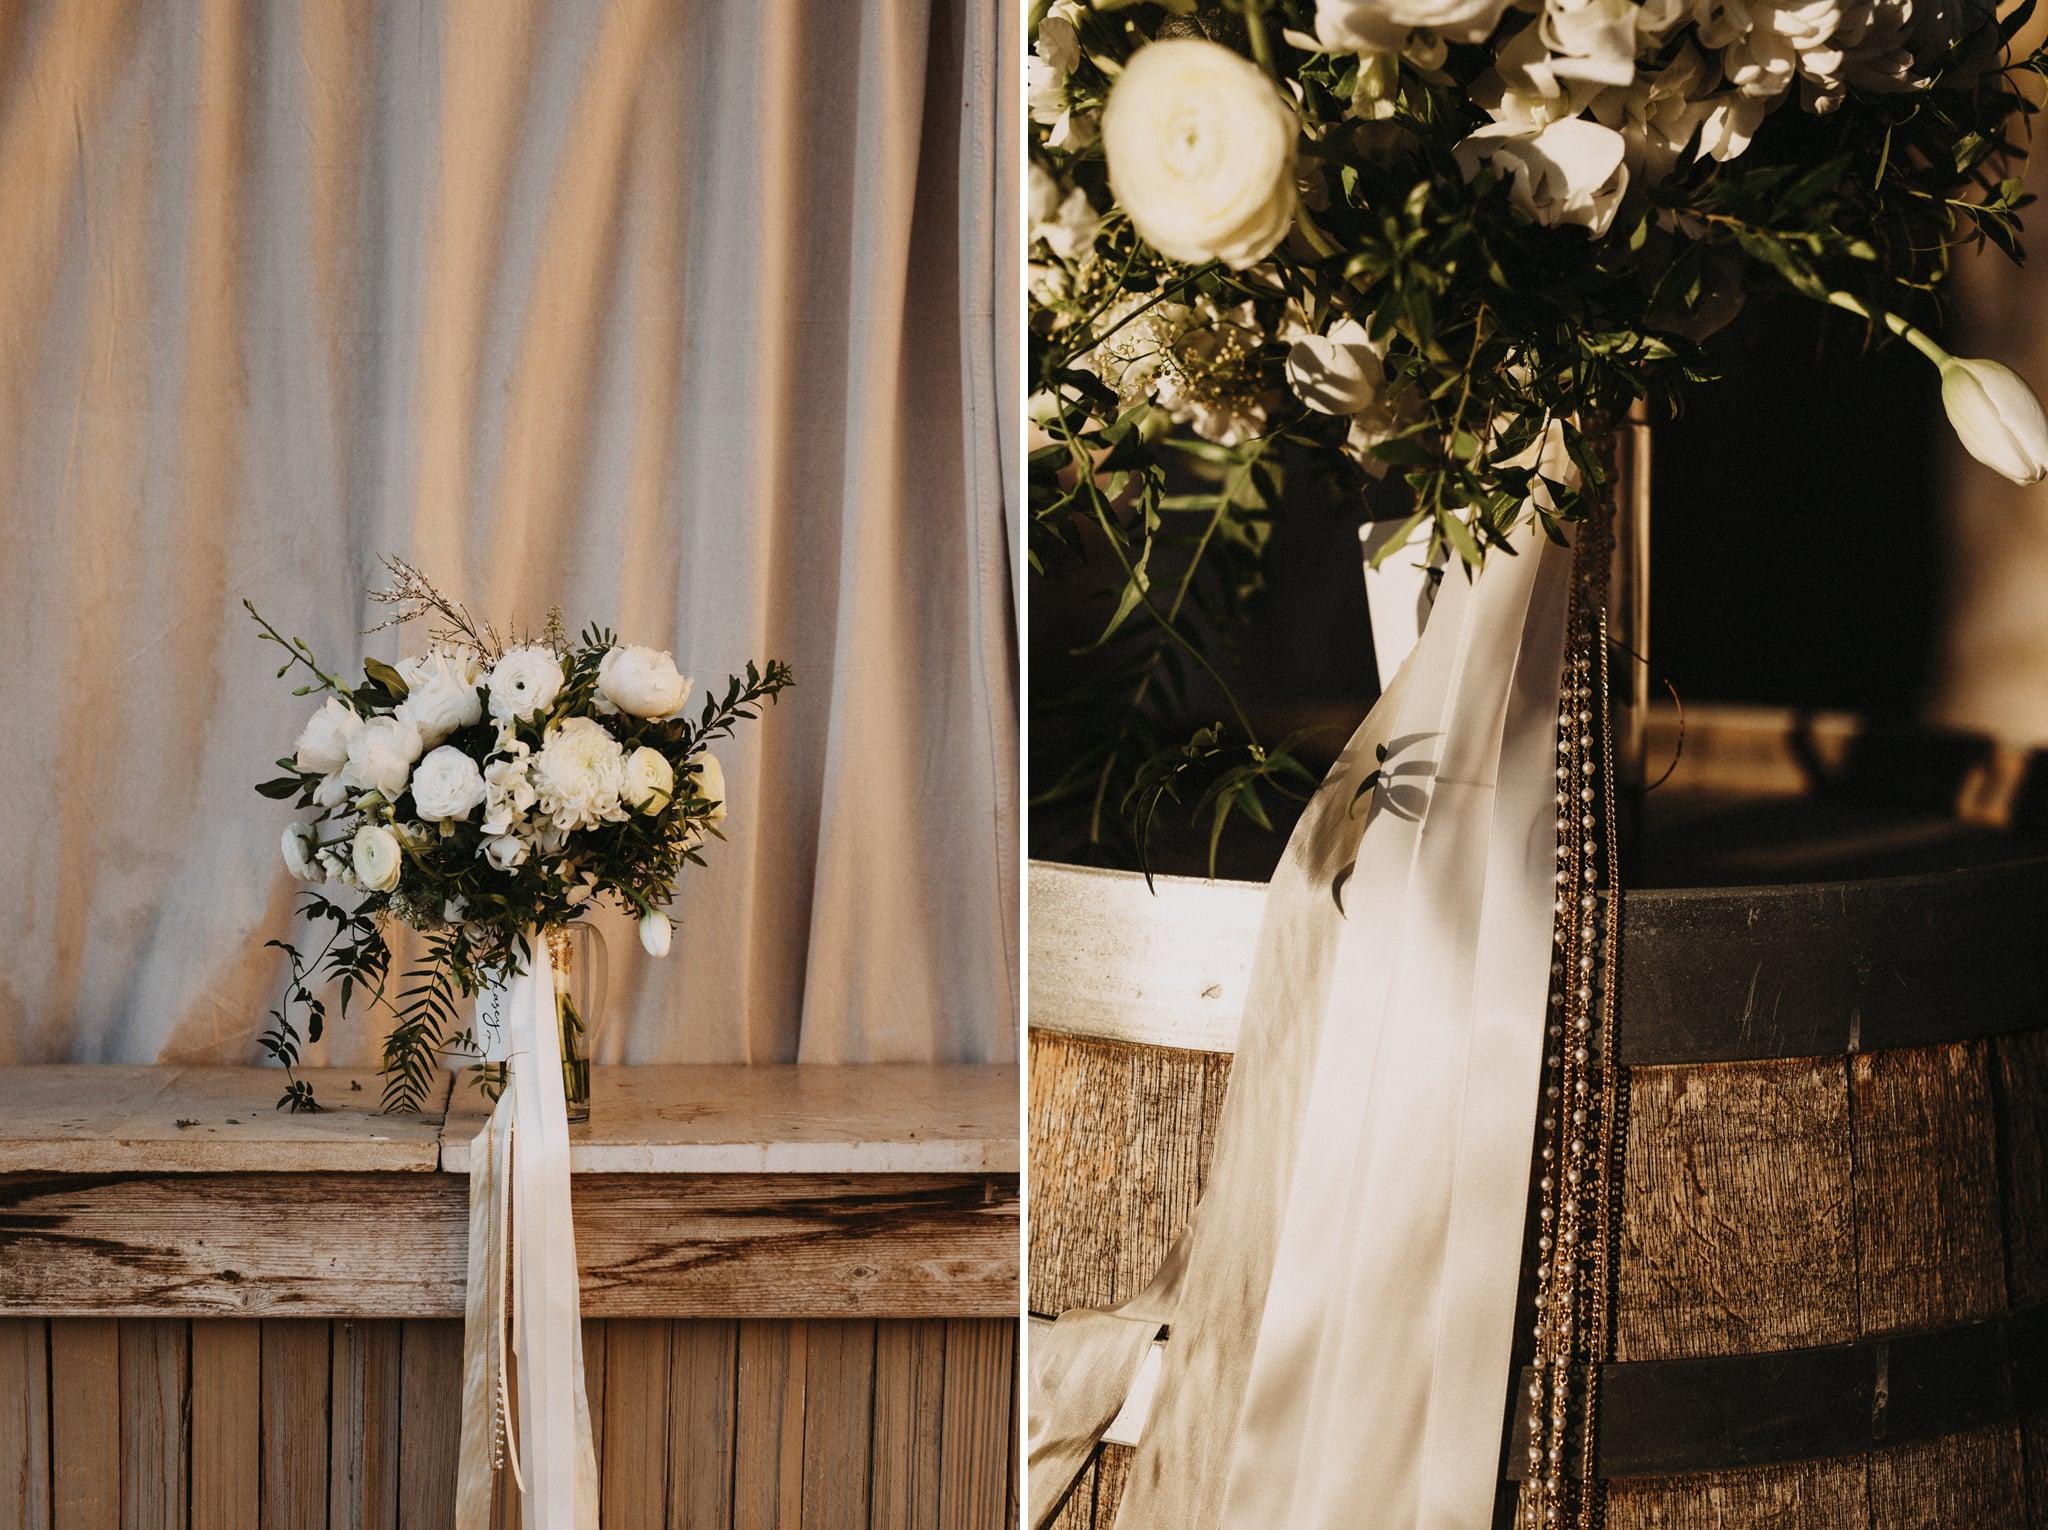 Bridal-Flower-Design-Ideas